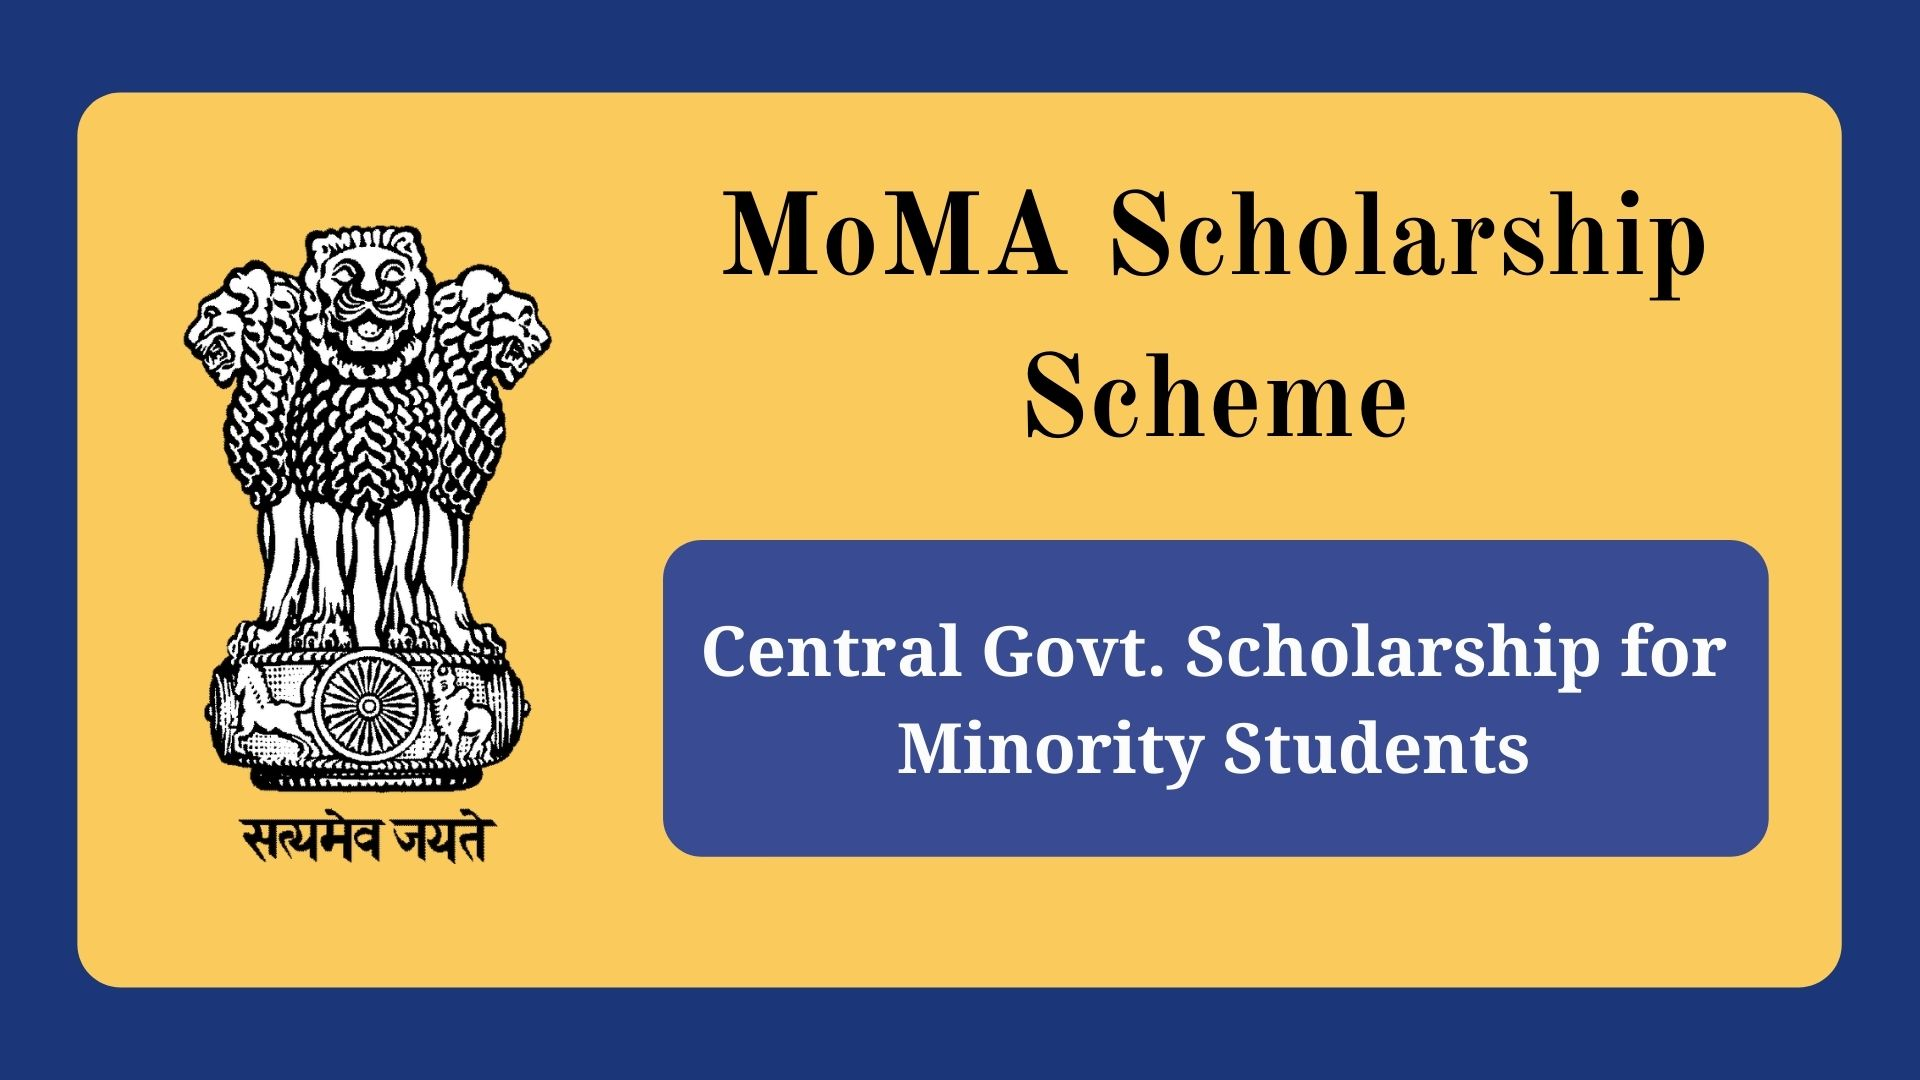 MoMA Scholarship 2021 for Minority Students